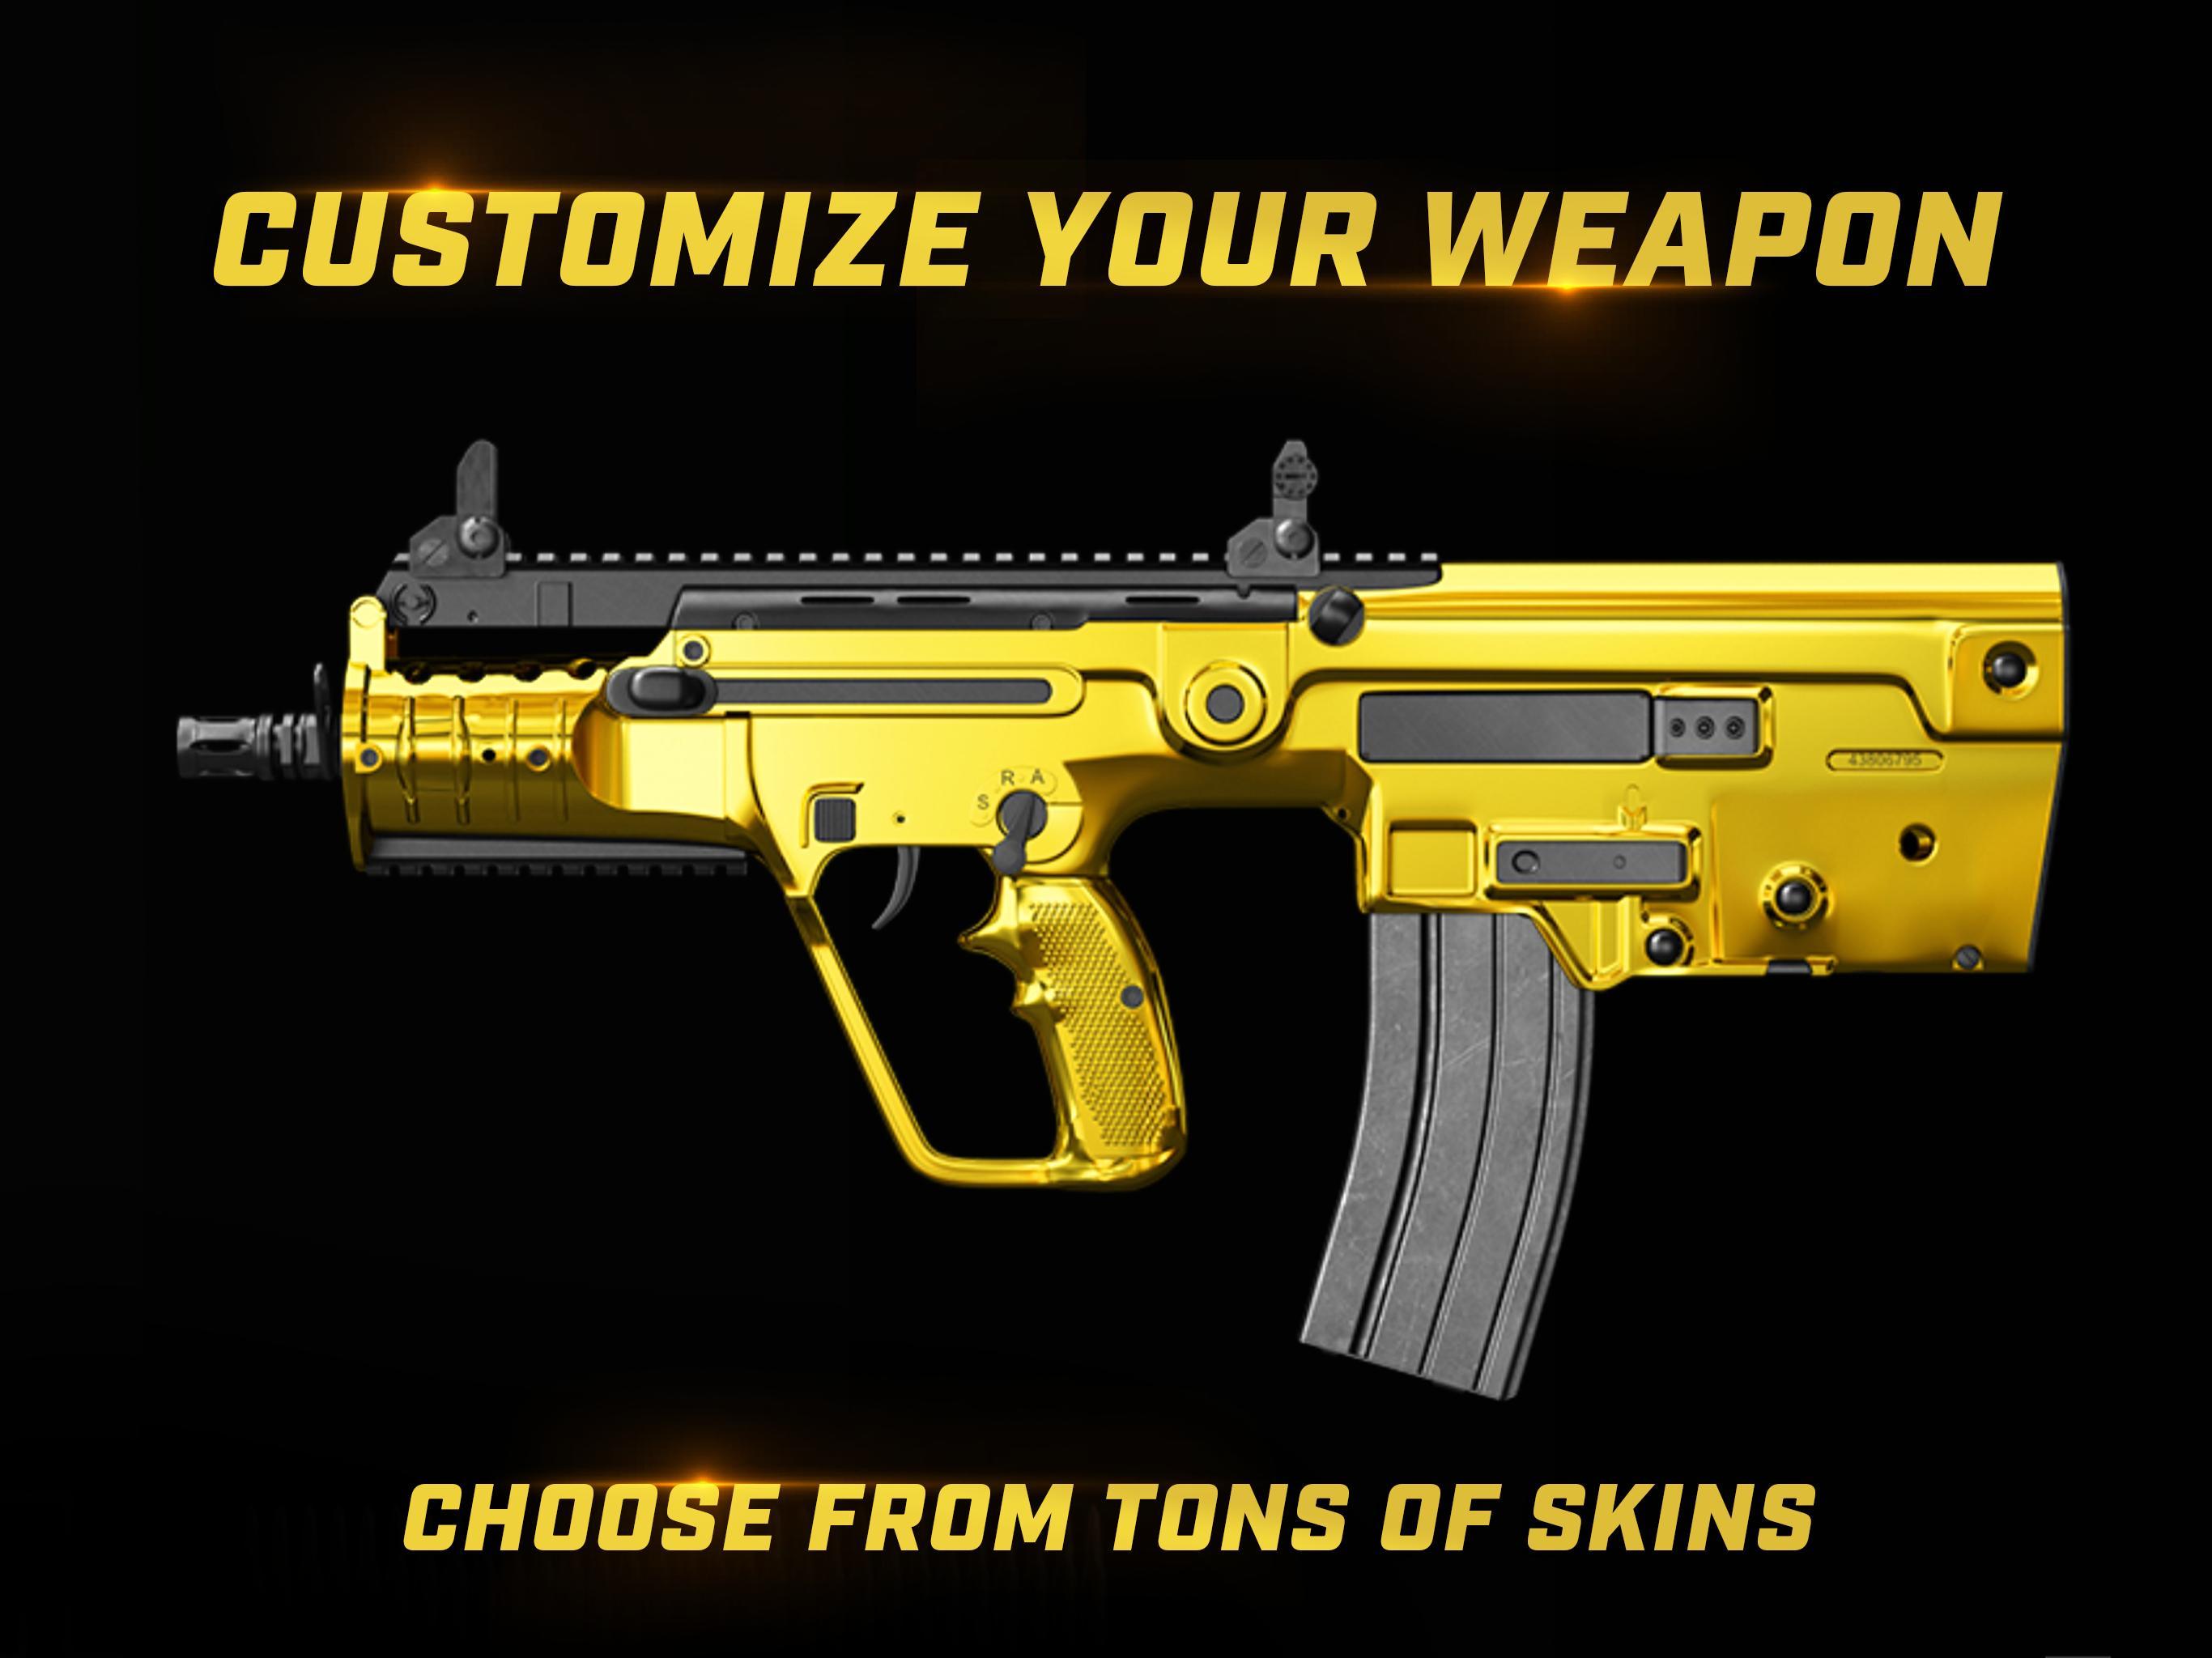 iGun Pro The Original Gun App 5.26 Screenshot 14